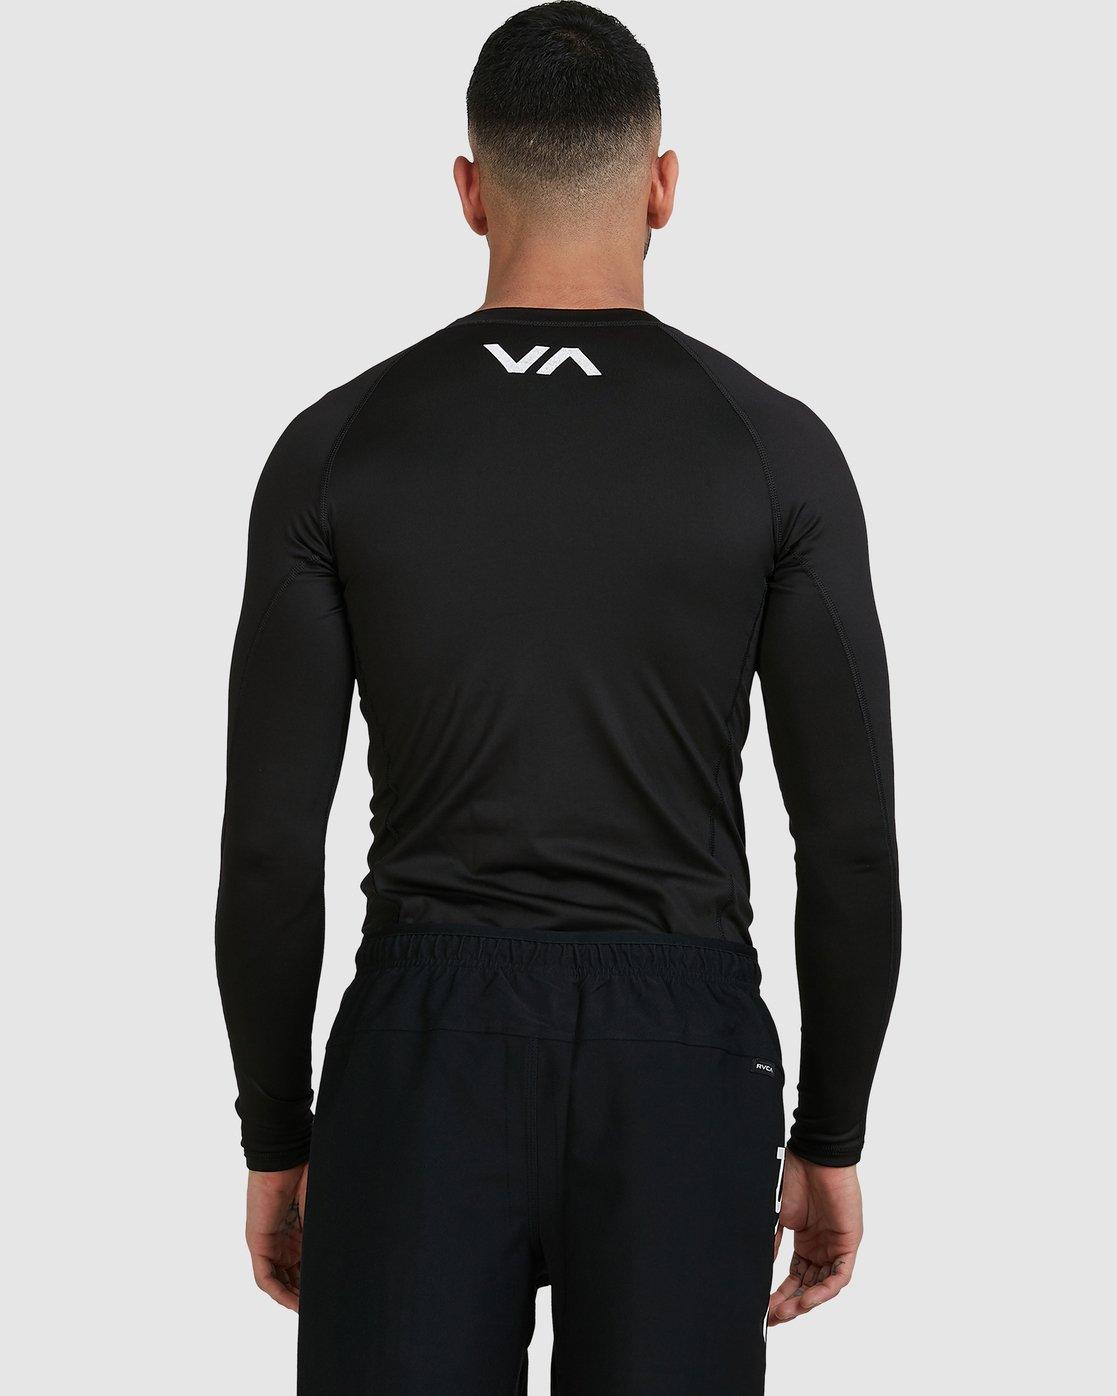 4 Sport Long Sleeve Rashguard Black R381661 RVCA